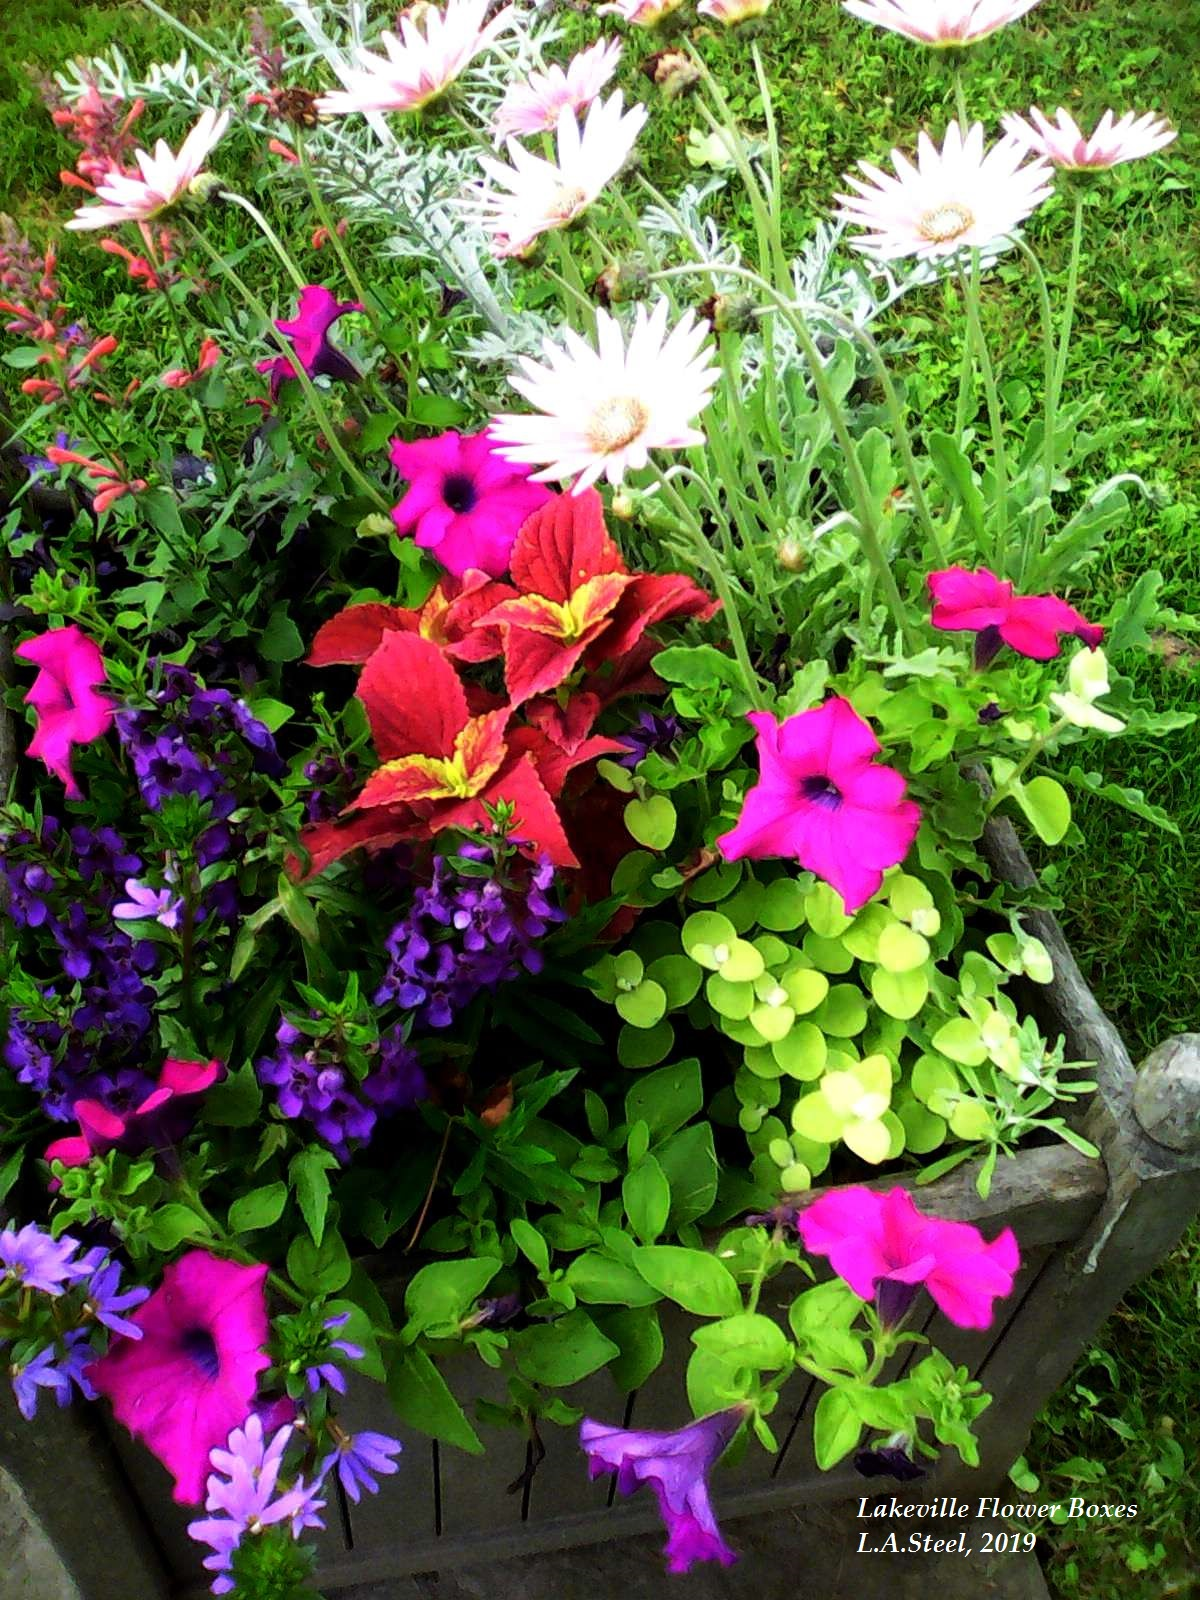 lakeville flower box 6 2019